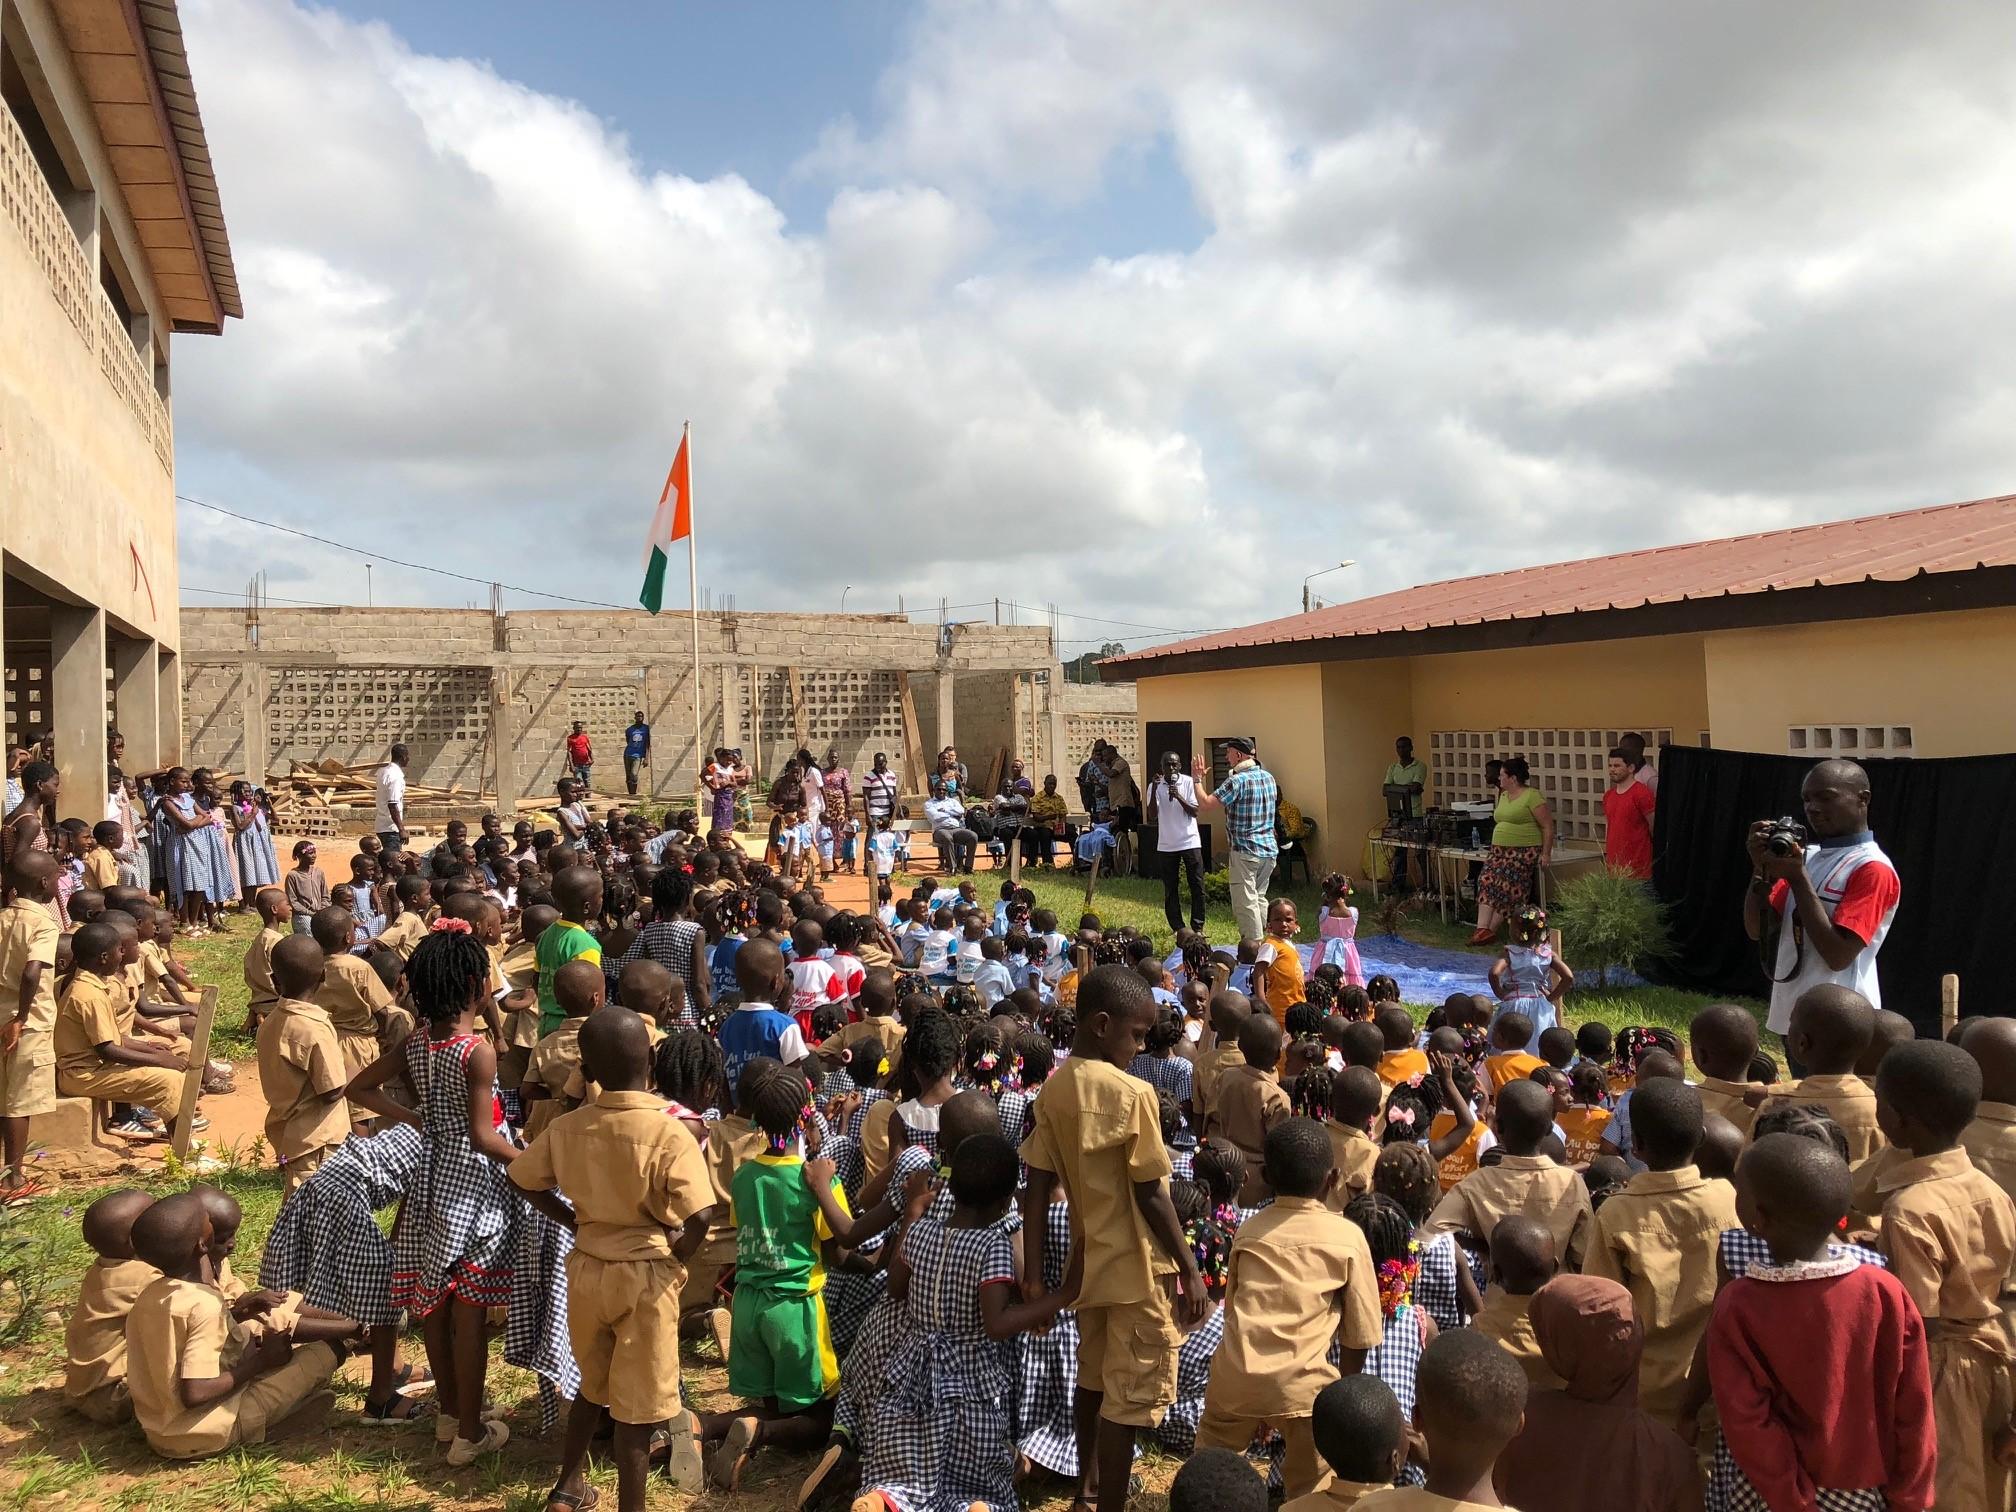 Dougie Dug Dug sharing the Good News in a school in Abidjan.